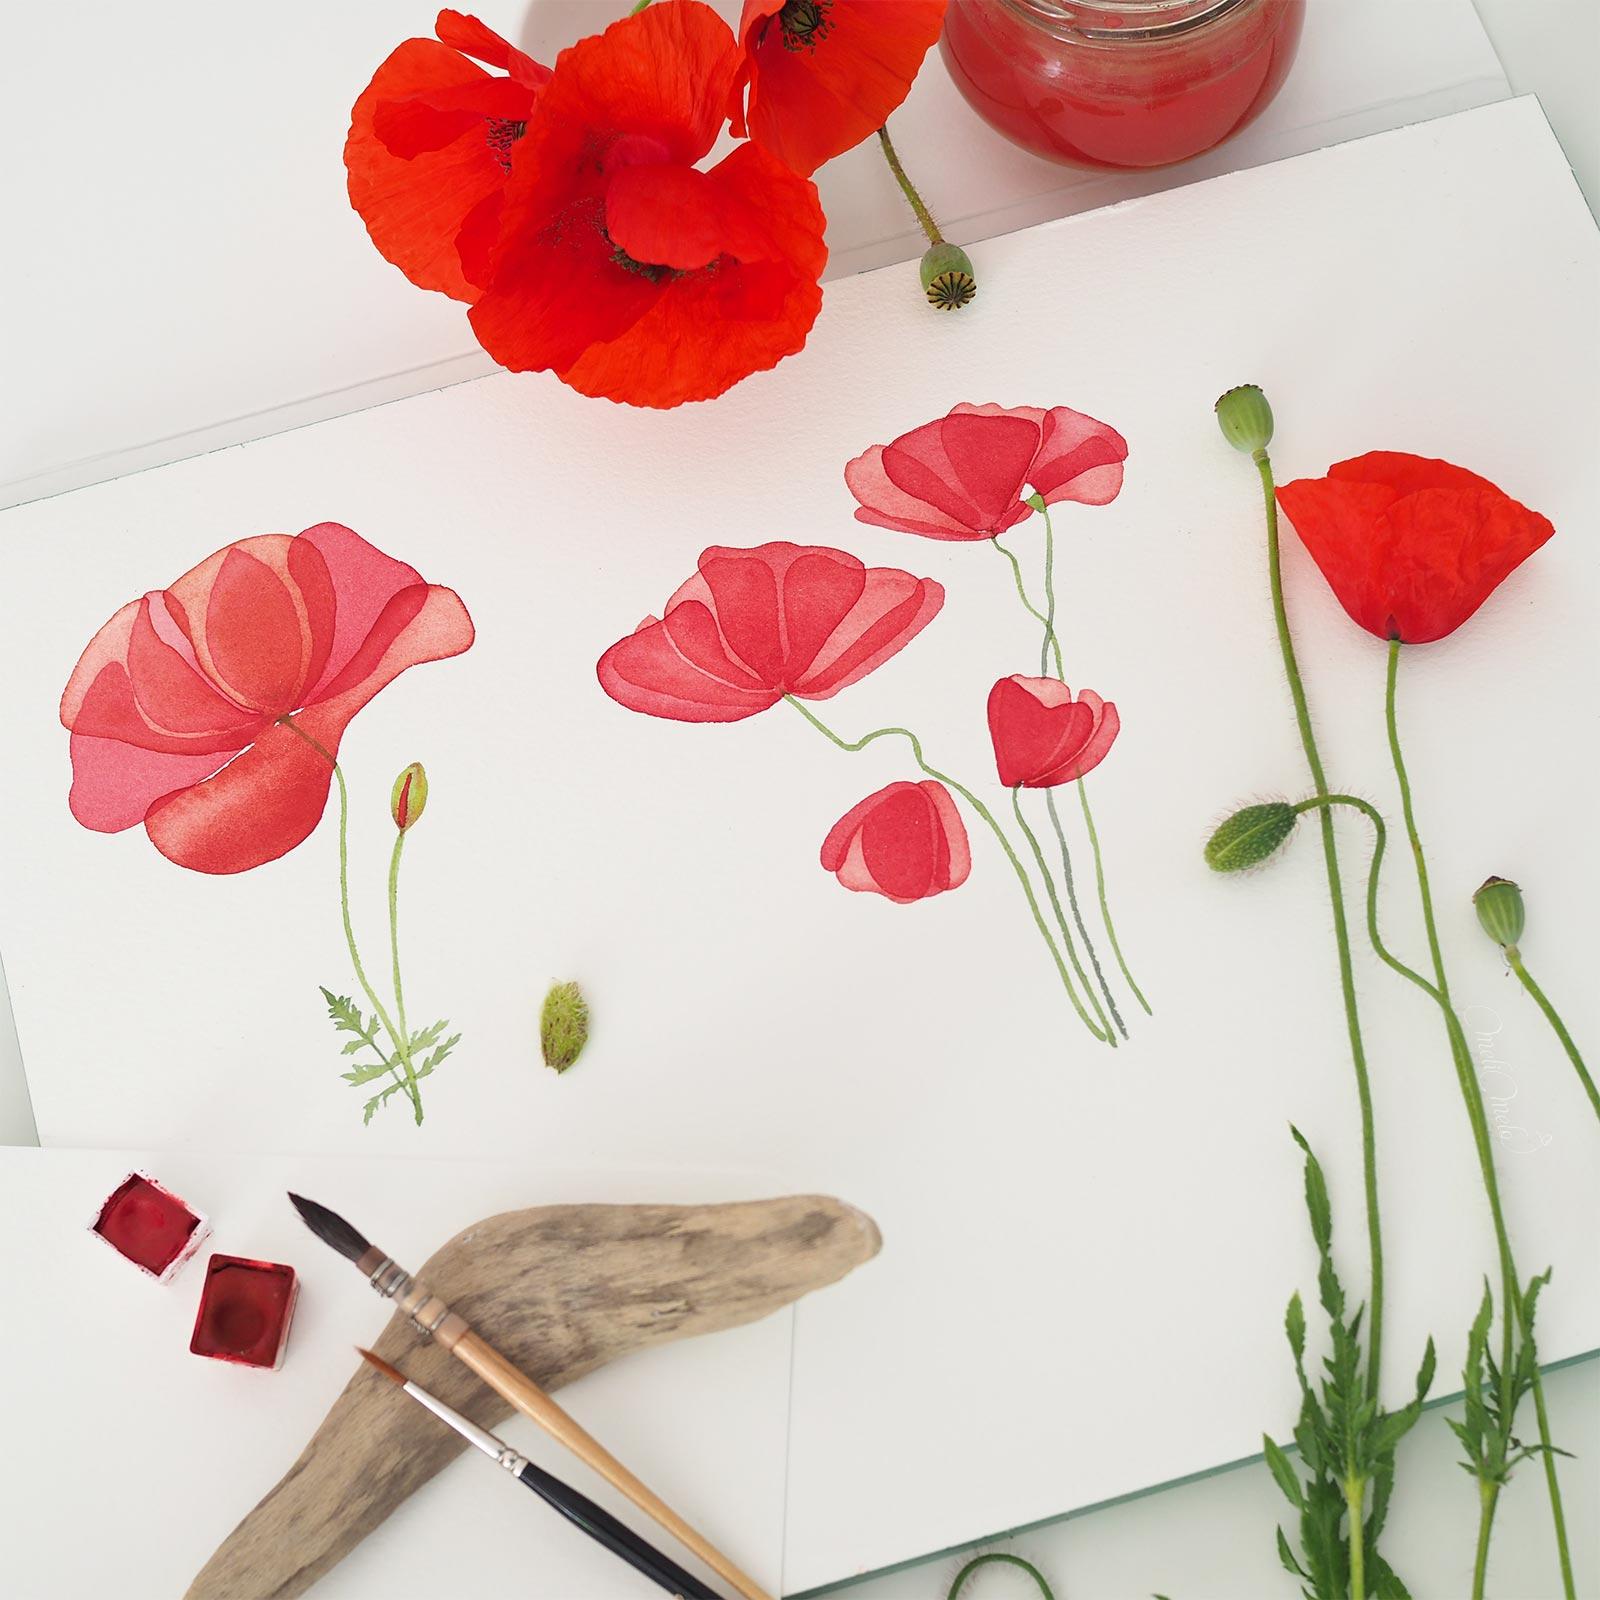 fleurs-coquelicot-aquarelle-windsorandnewton-watercolor-jazperstardust-red-gold-laboutiquedemelimelo